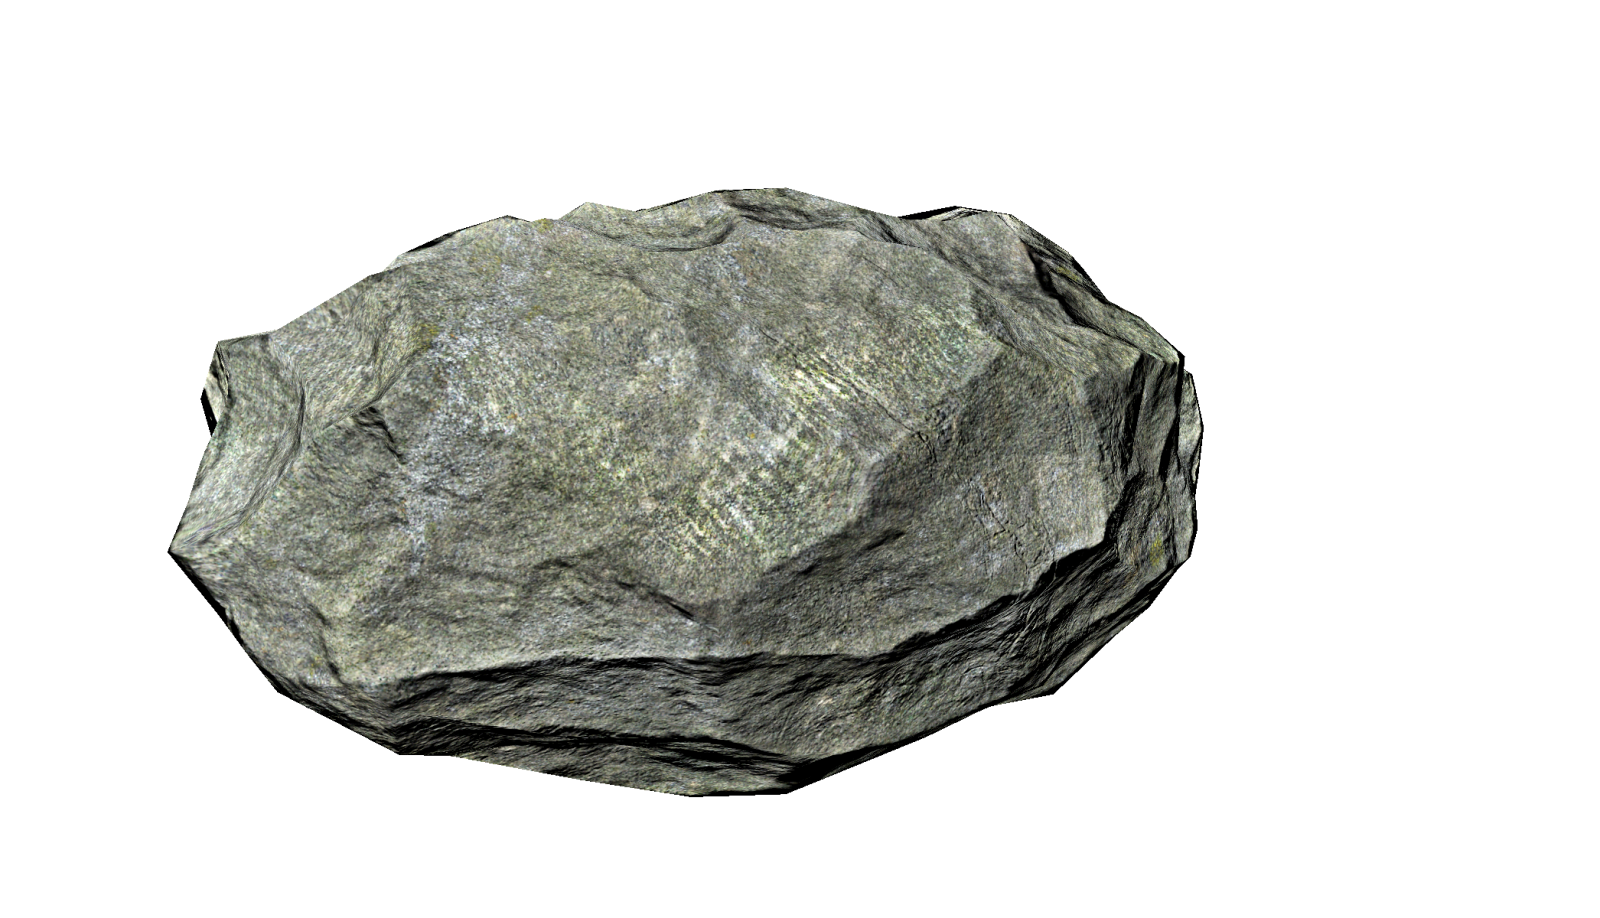 rock png - Google Search - Rock PNG